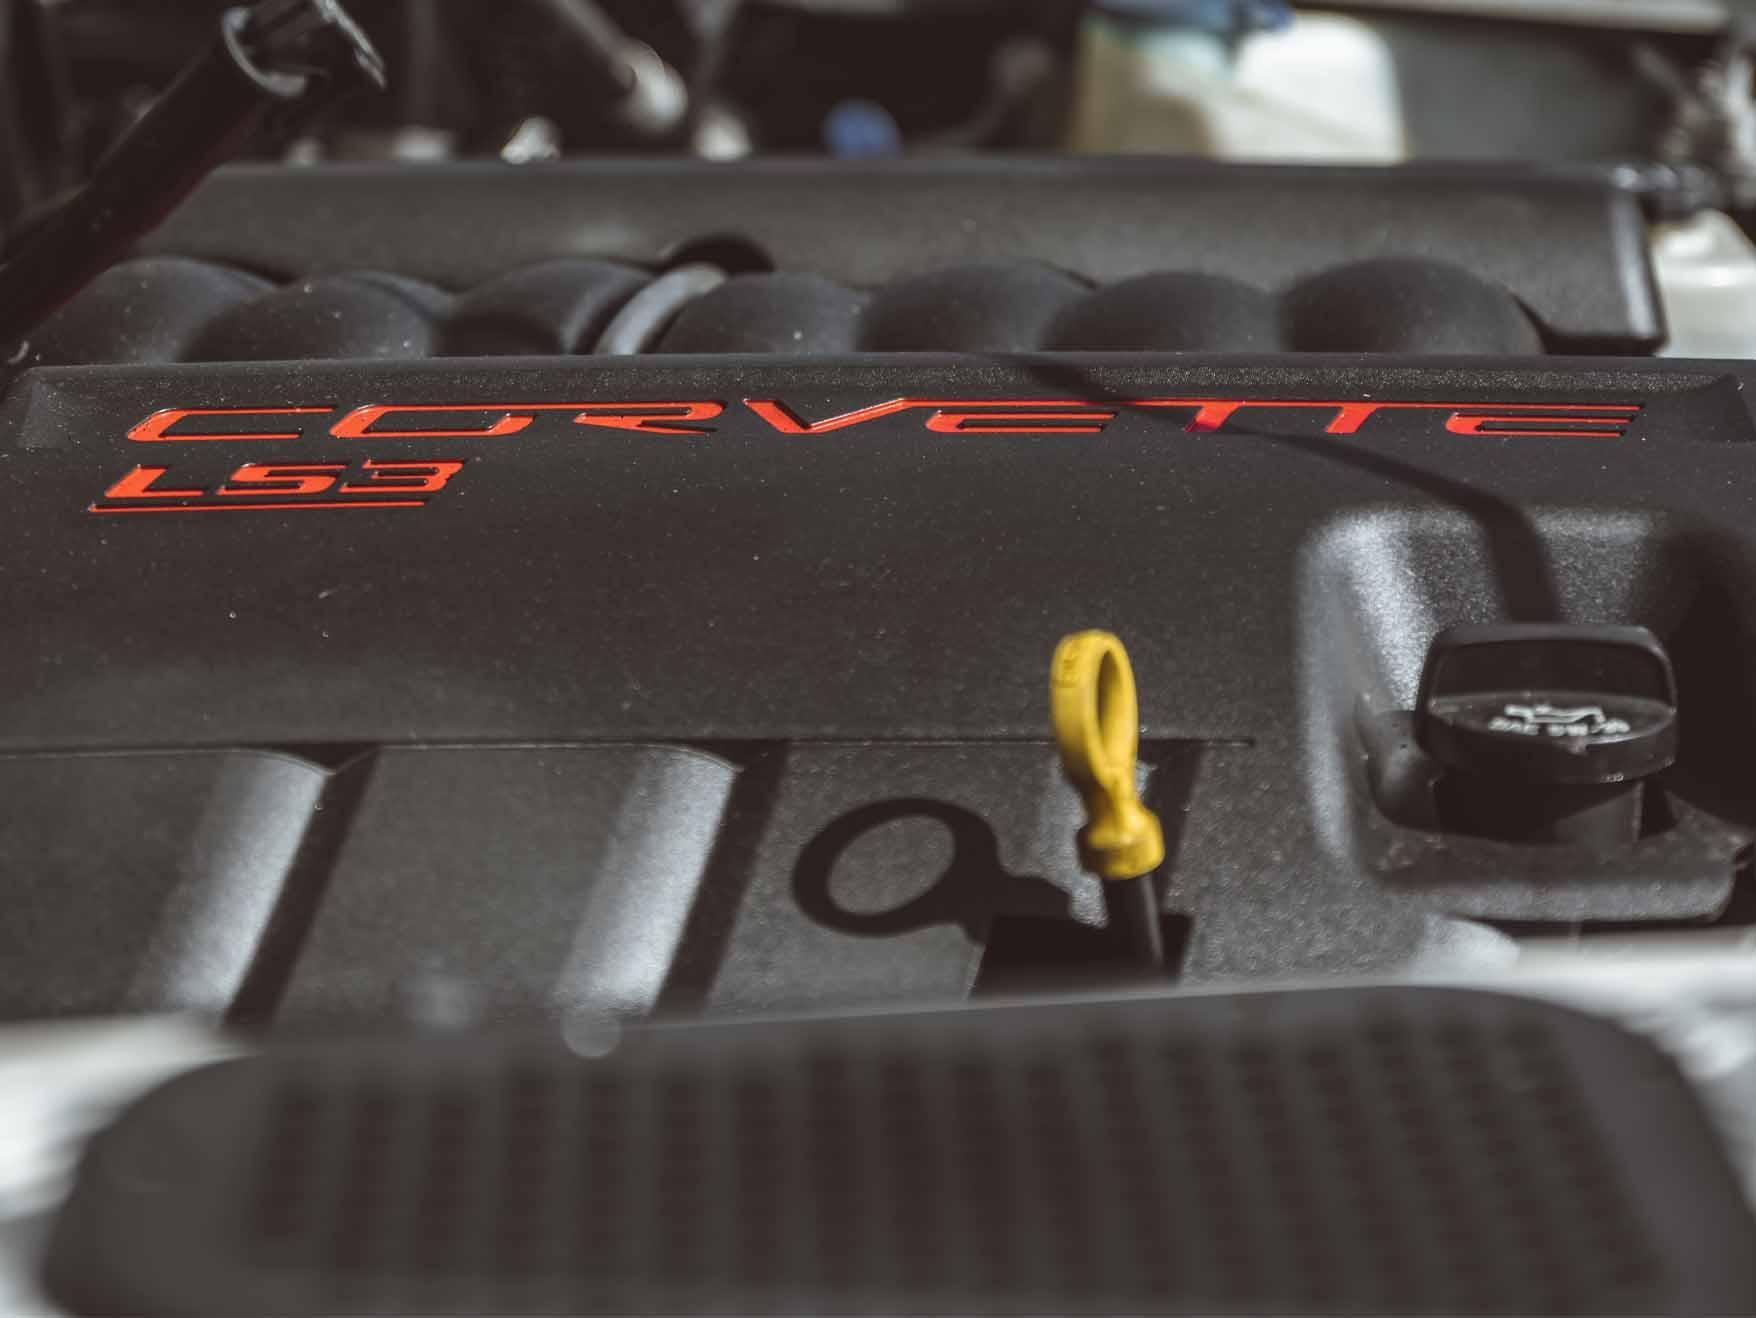 Land_Rover_130_Expedition_medium_0000_Layer 12.jpg